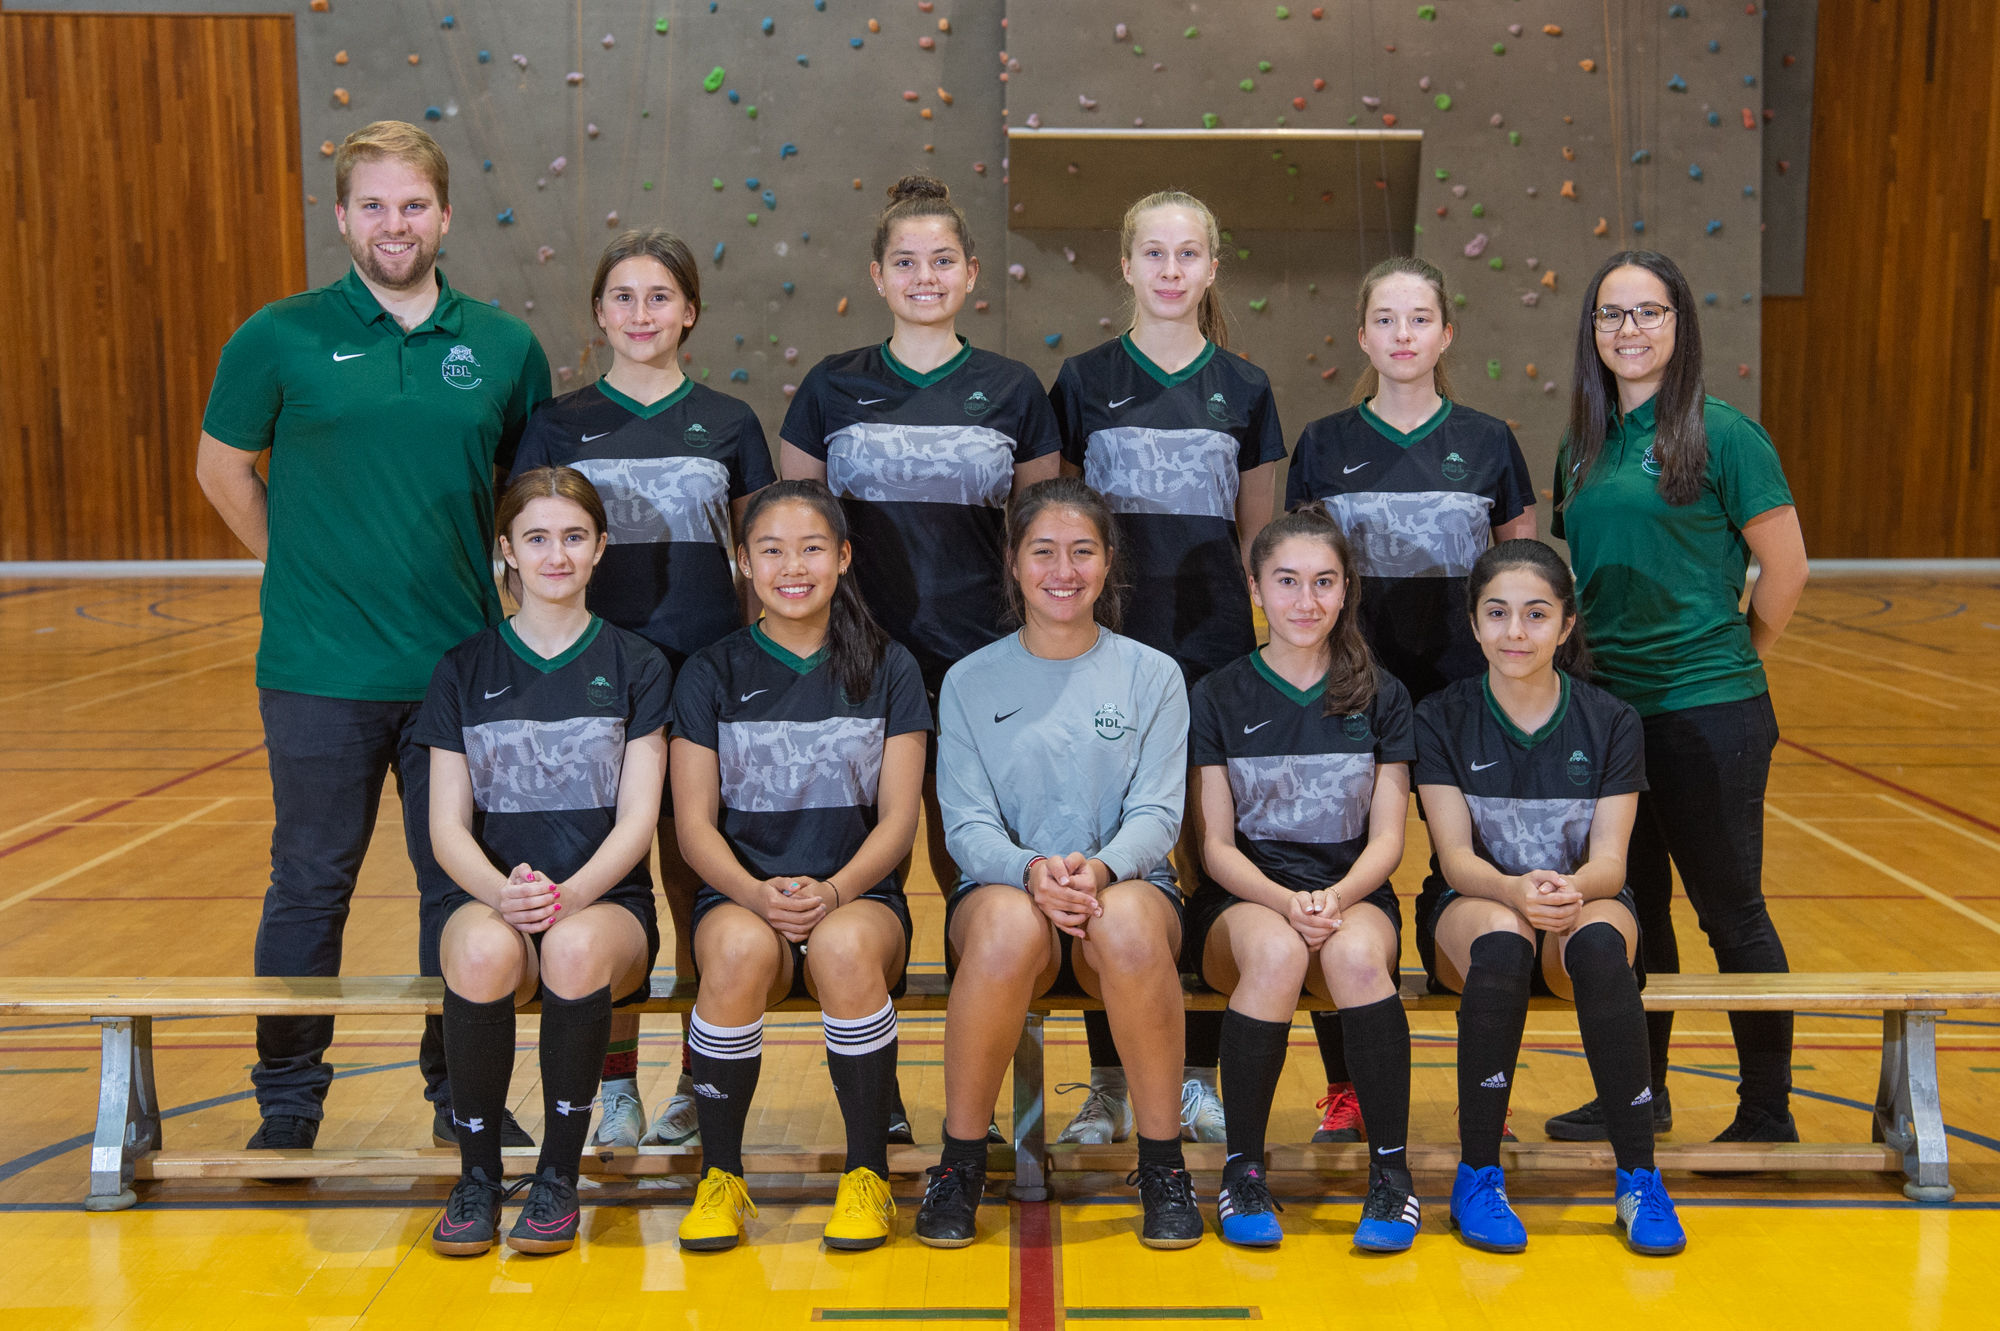 NDL_Preds 2019-2020 Futsal JFD2